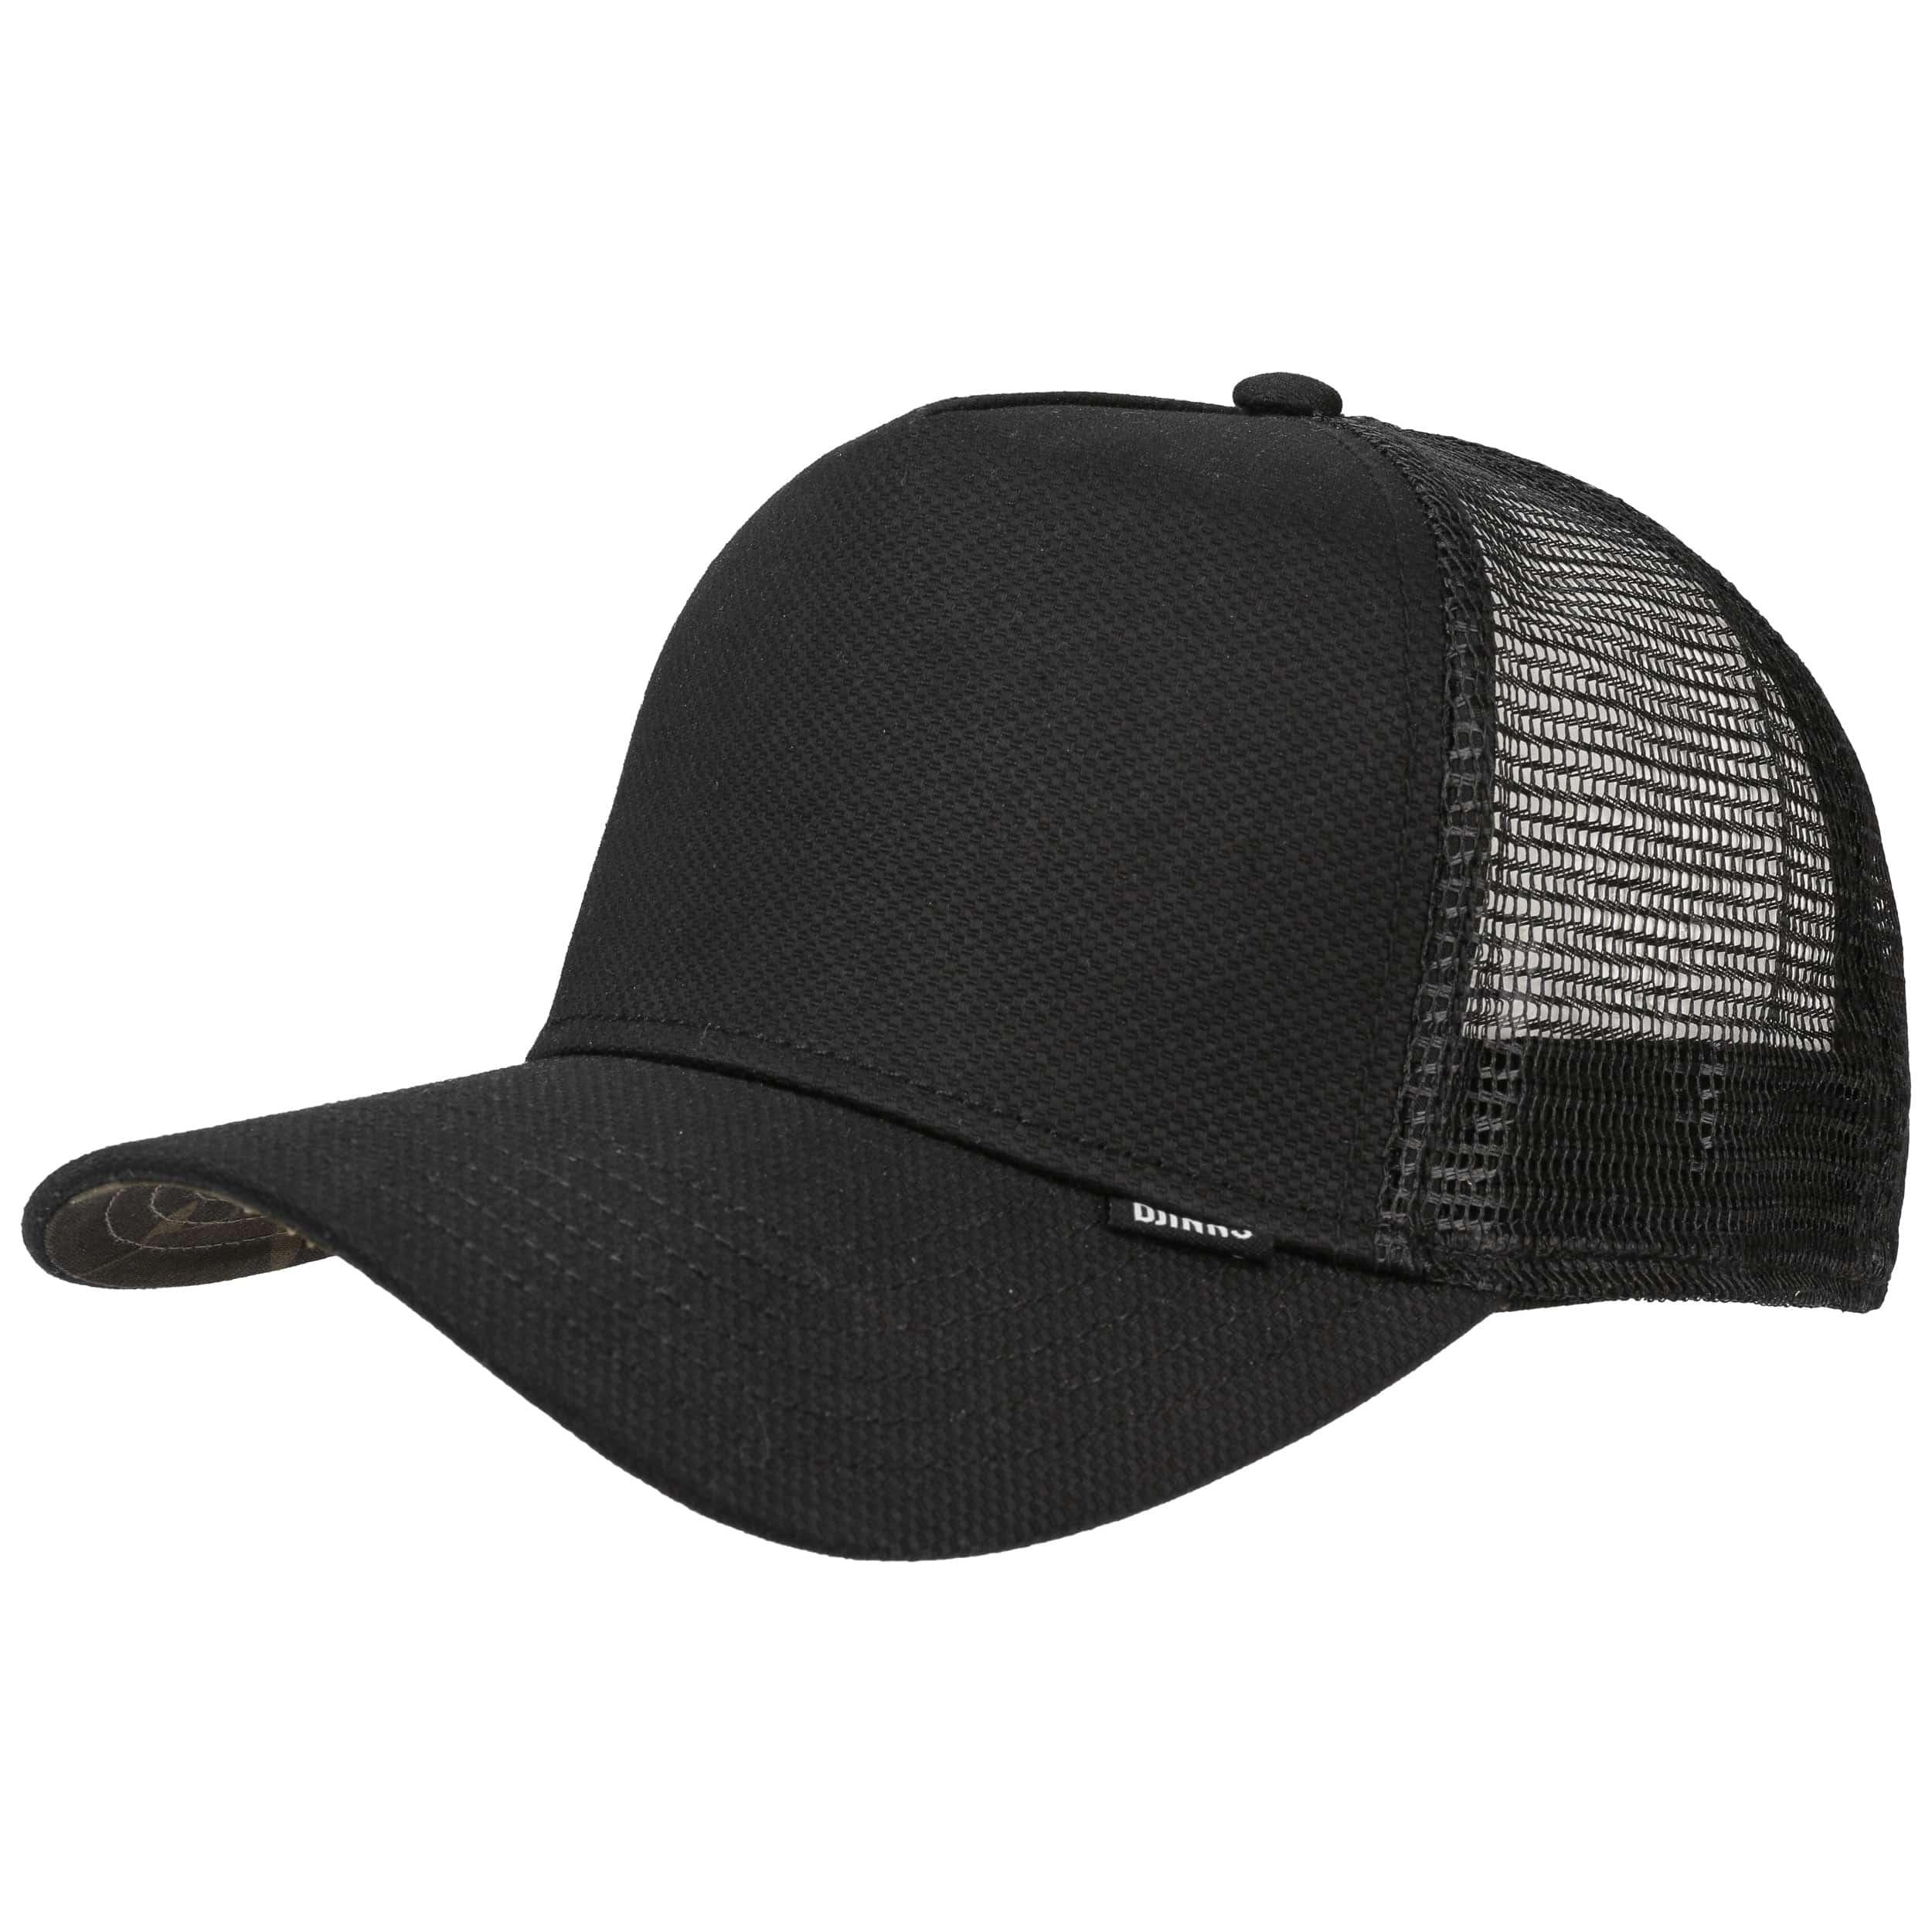 hump camo hft trucker cap by djinns gbp 19 95 hats. Black Bedroom Furniture Sets. Home Design Ideas